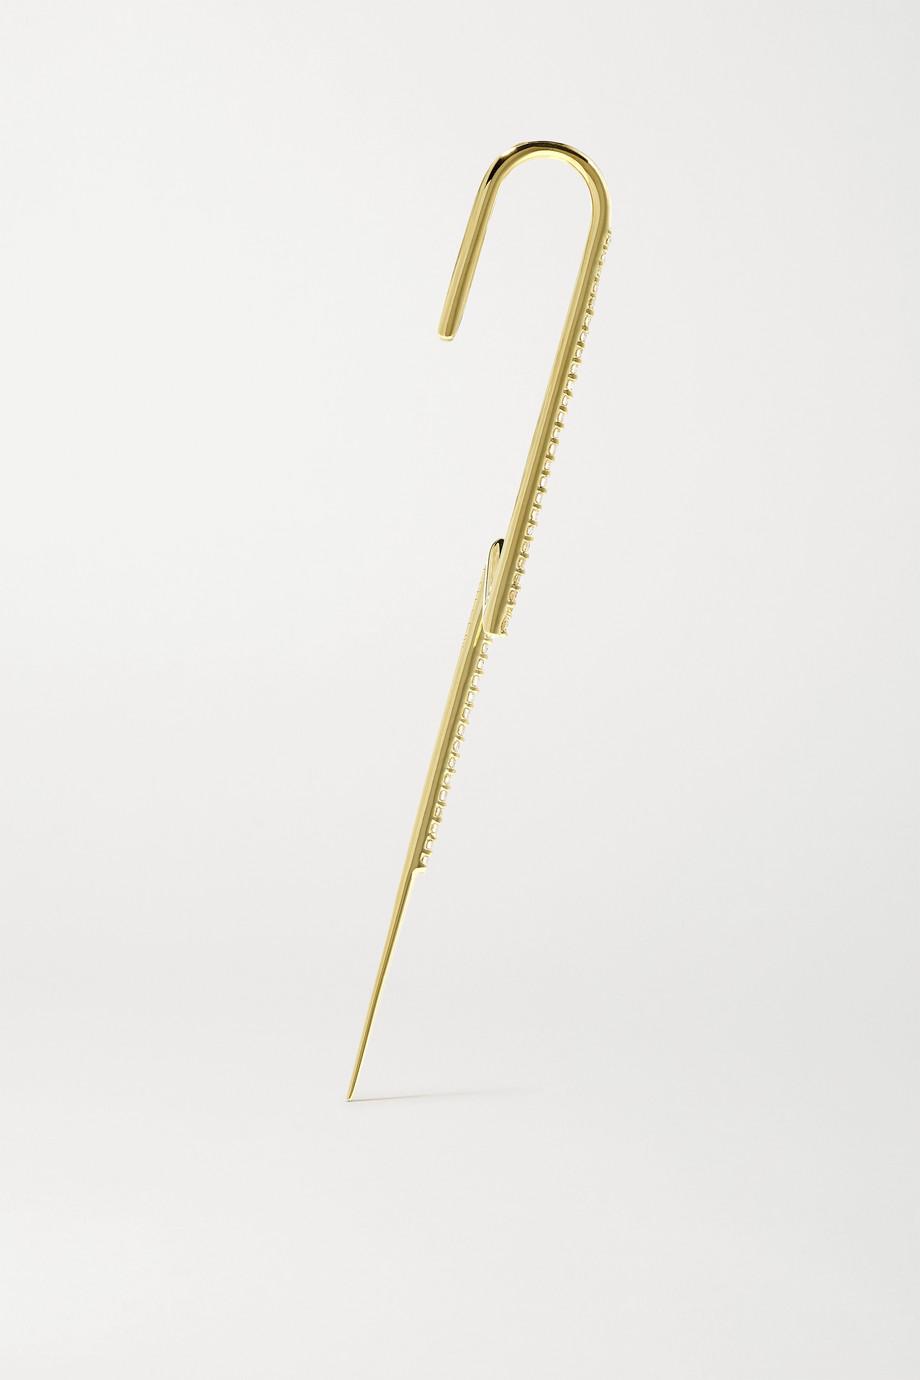 KATKIM Flash gold and diamond ear pin